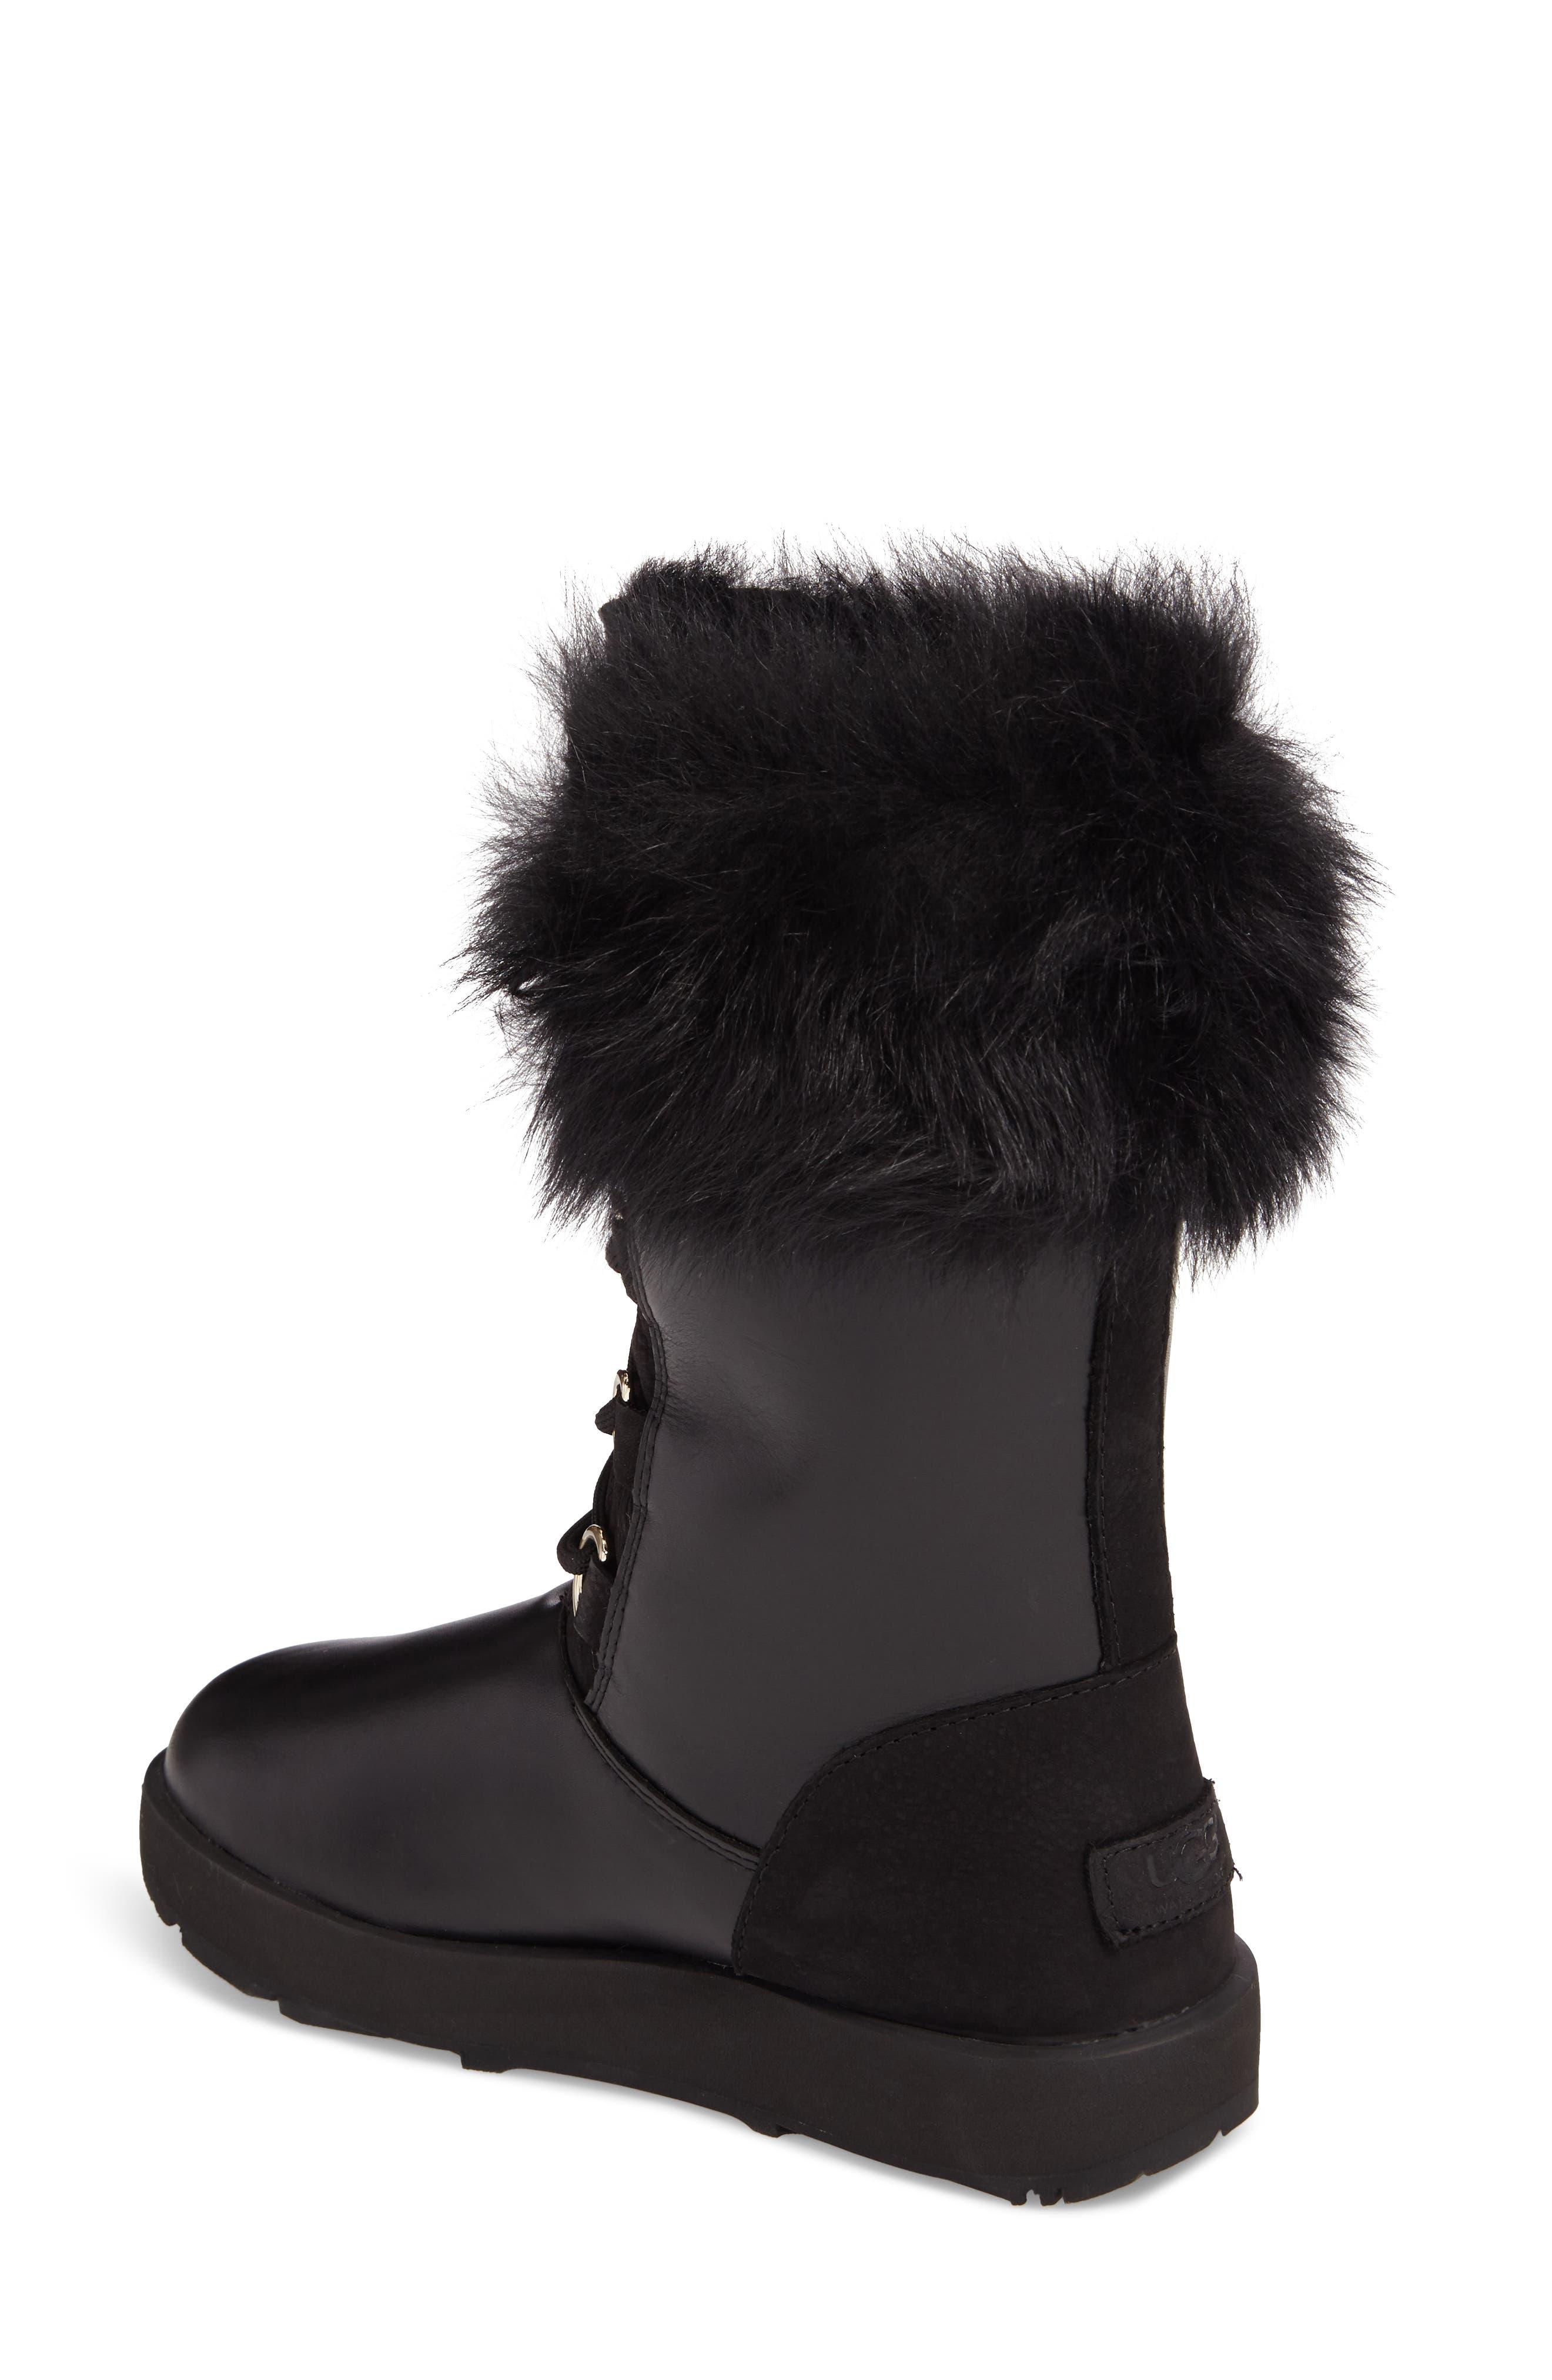 Aya Waterproof Snow Boot,                             Alternate thumbnail 2, color,                             001